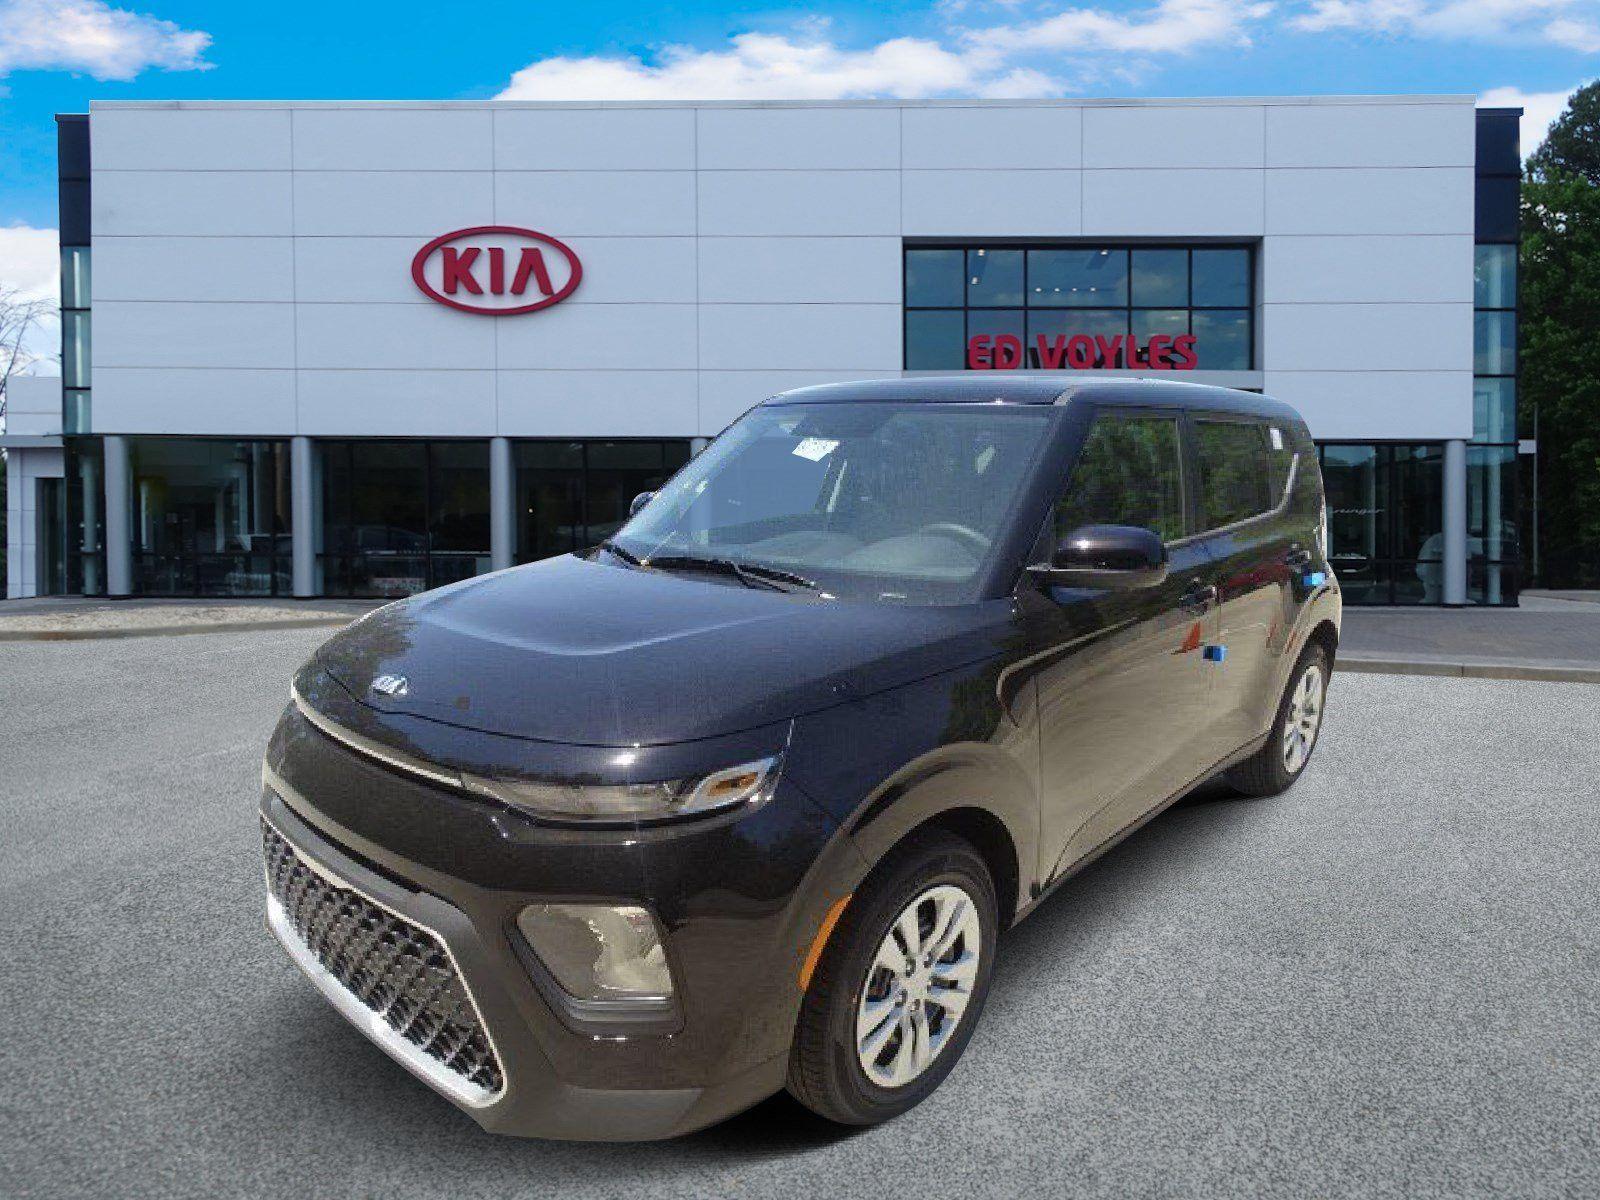 New 2020 Kia Soul LX Hatchback for Sale Lexus sports car